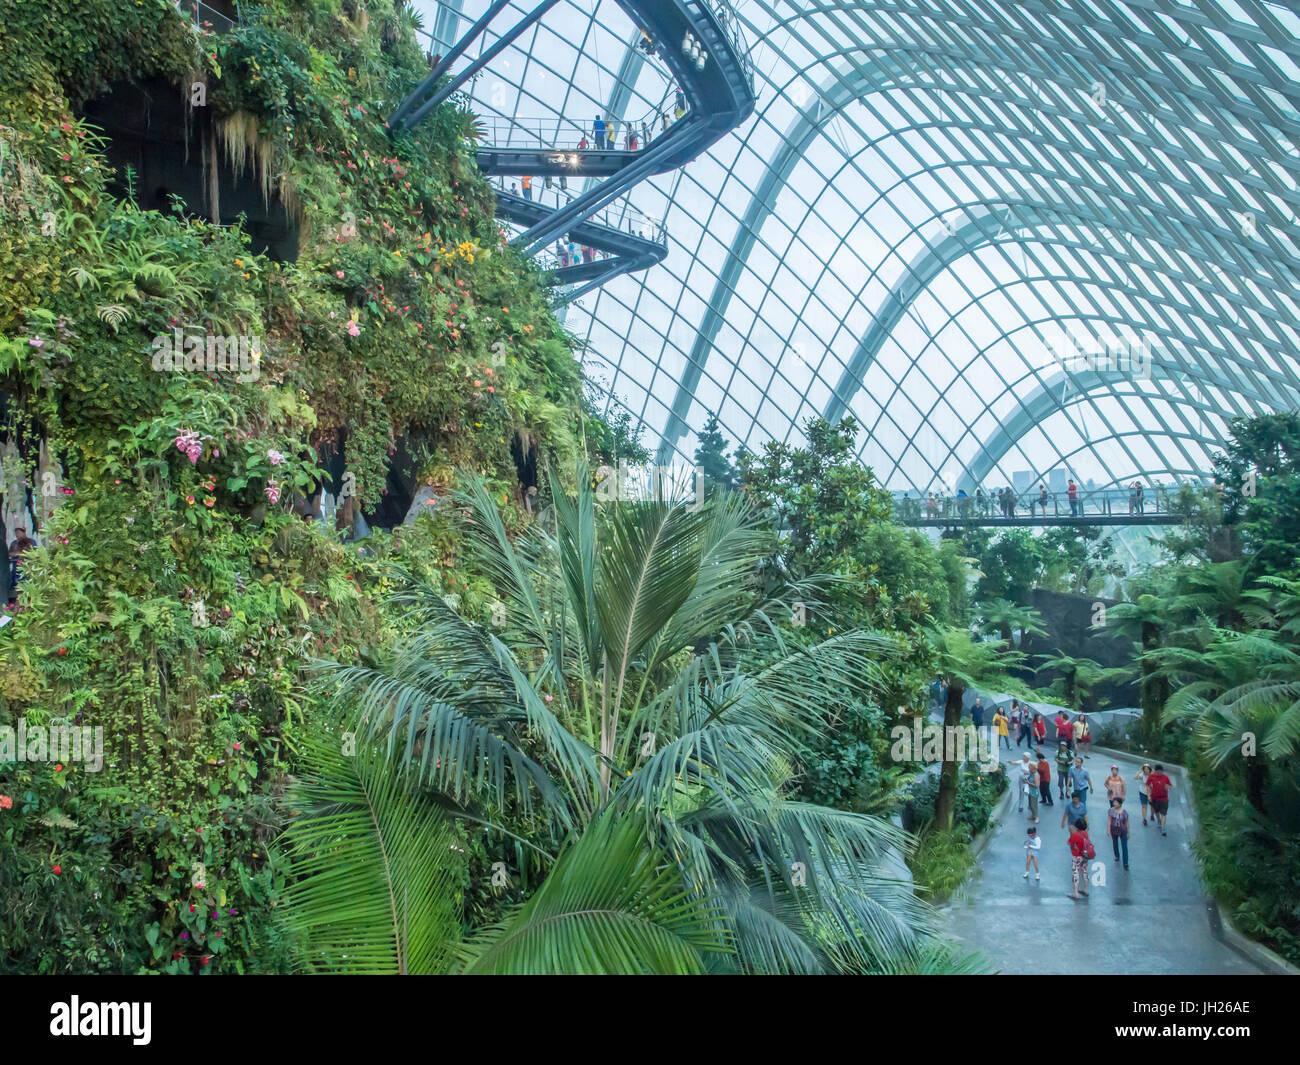 Indoor rainforest garden, Gardens by the Bay, Singapore, Southeast ...